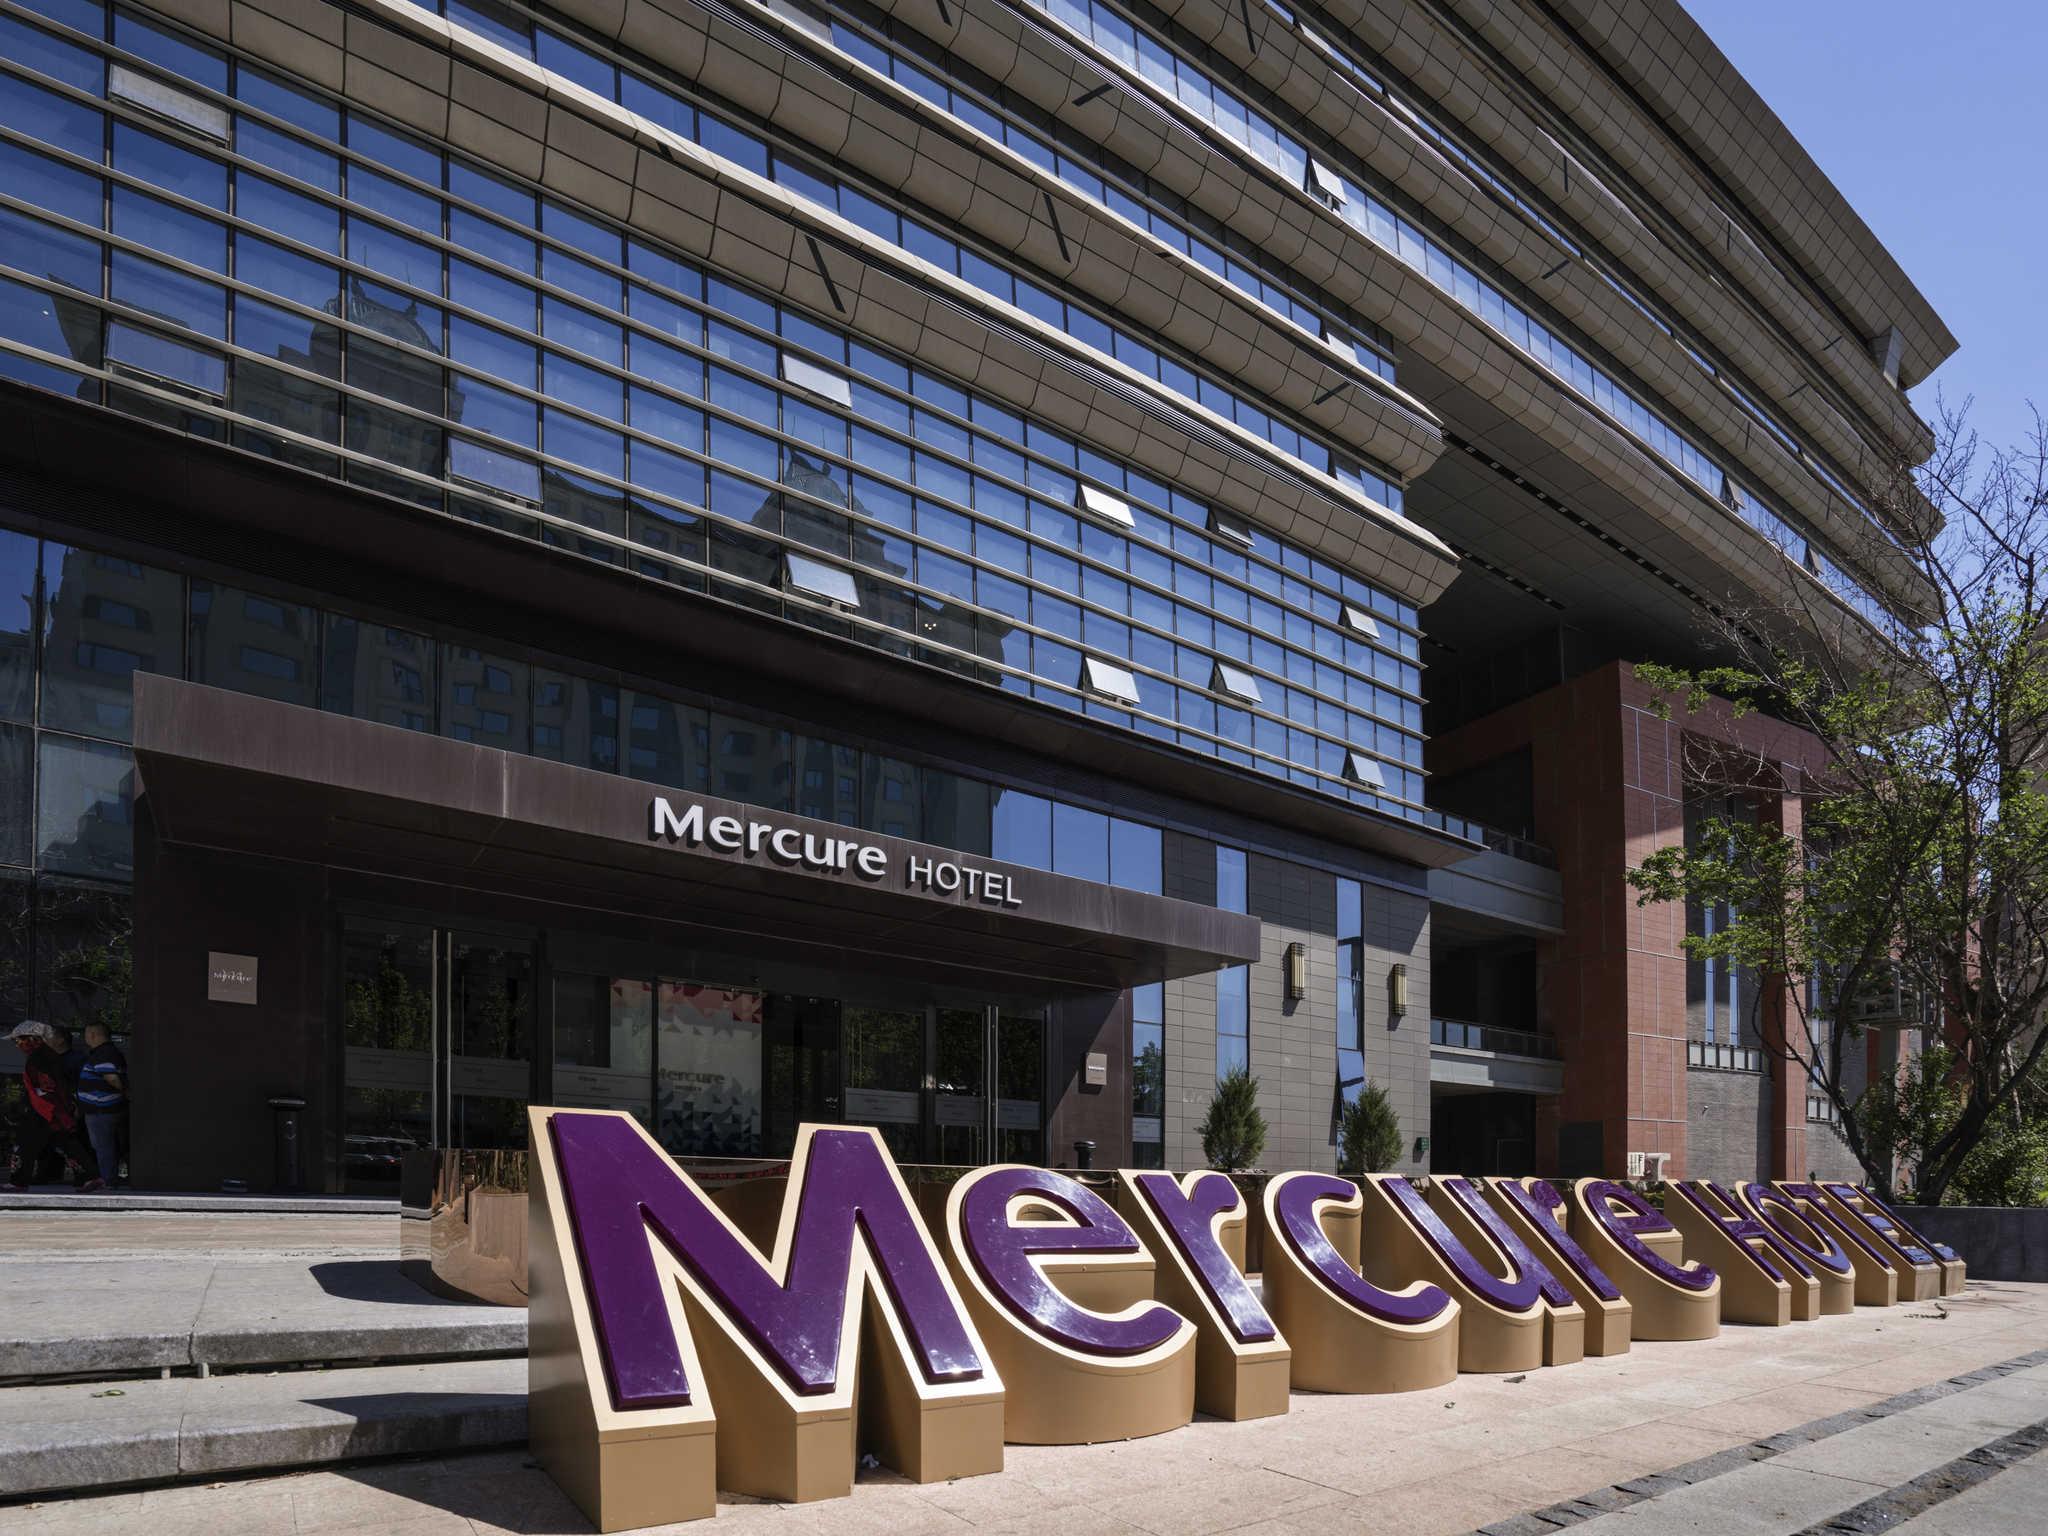 Hotel – Mercure Panjin (Opening December 2018)